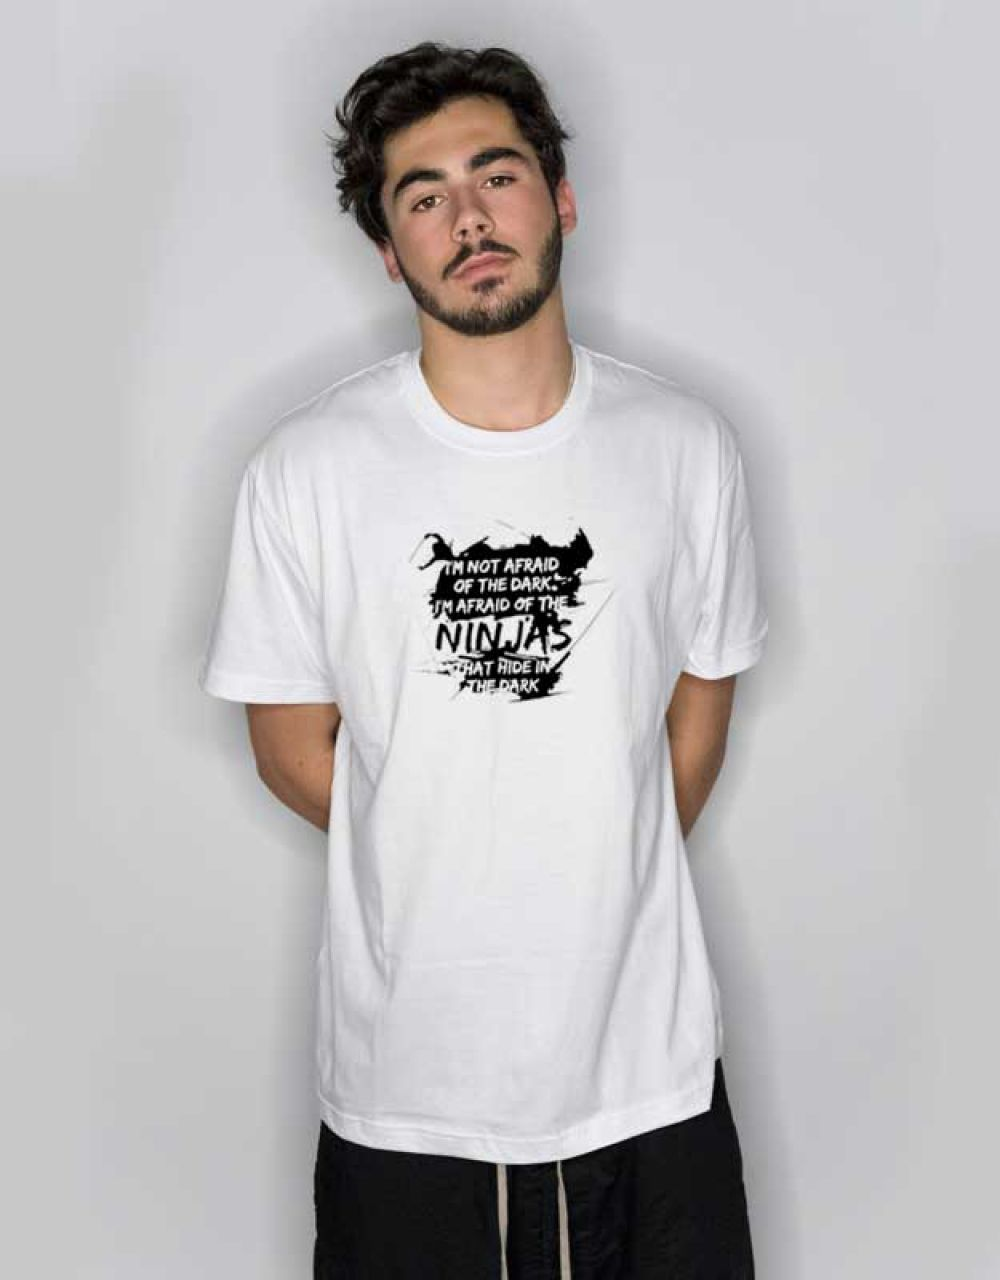 I M Not Afraid Of The Dark But The Ninja T Shirt Outfit Hypebeast Outfithype Streetwear Outfits Urbansteetwea Hogwarts T Shirt Bear T Shirt My T Shirt